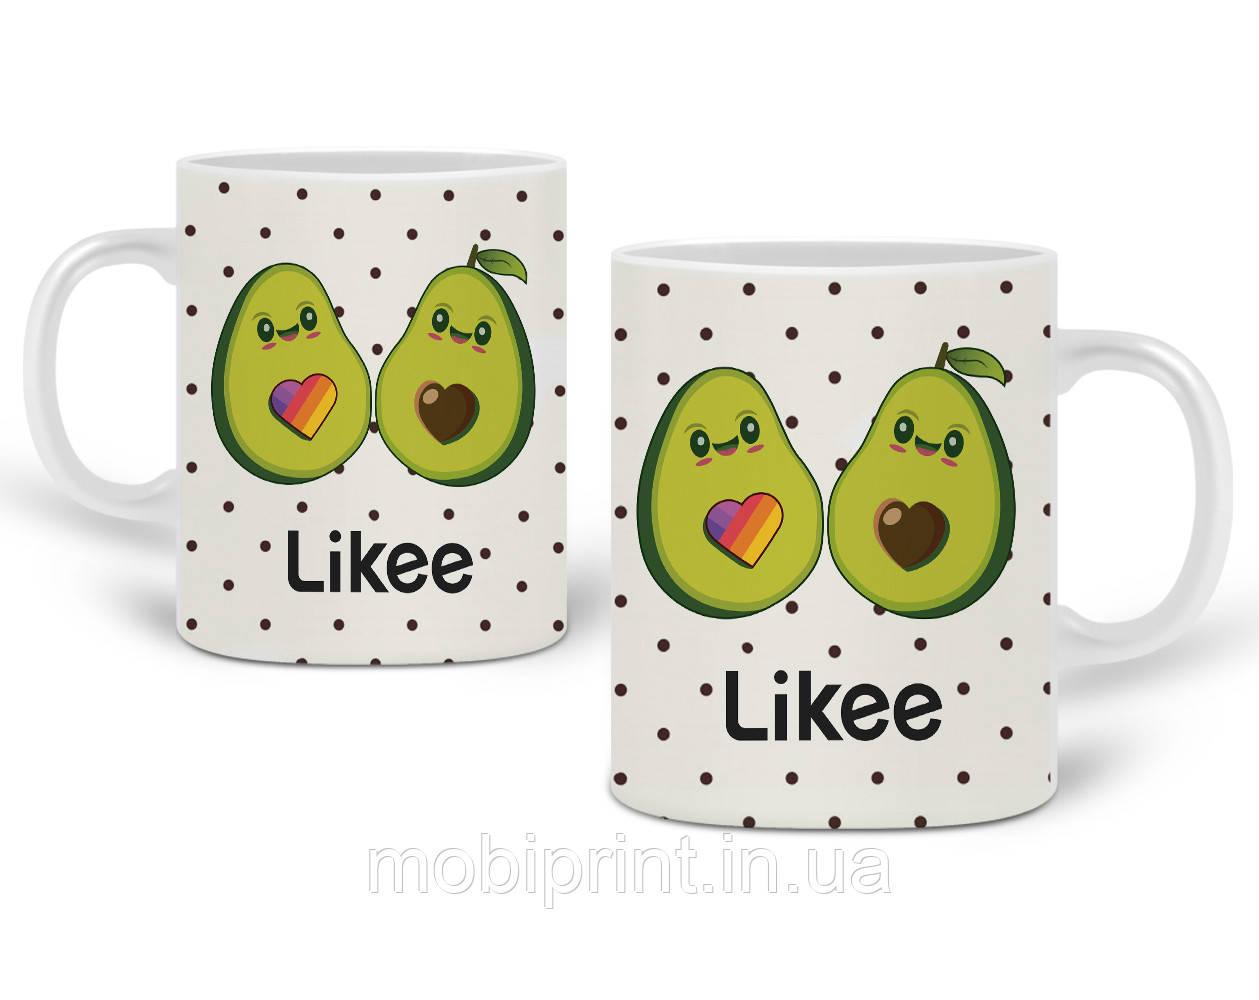 Кружка Лайк Авокадо (Likee Avocado) 330 мл Чашка Керамічна (20259-1031)